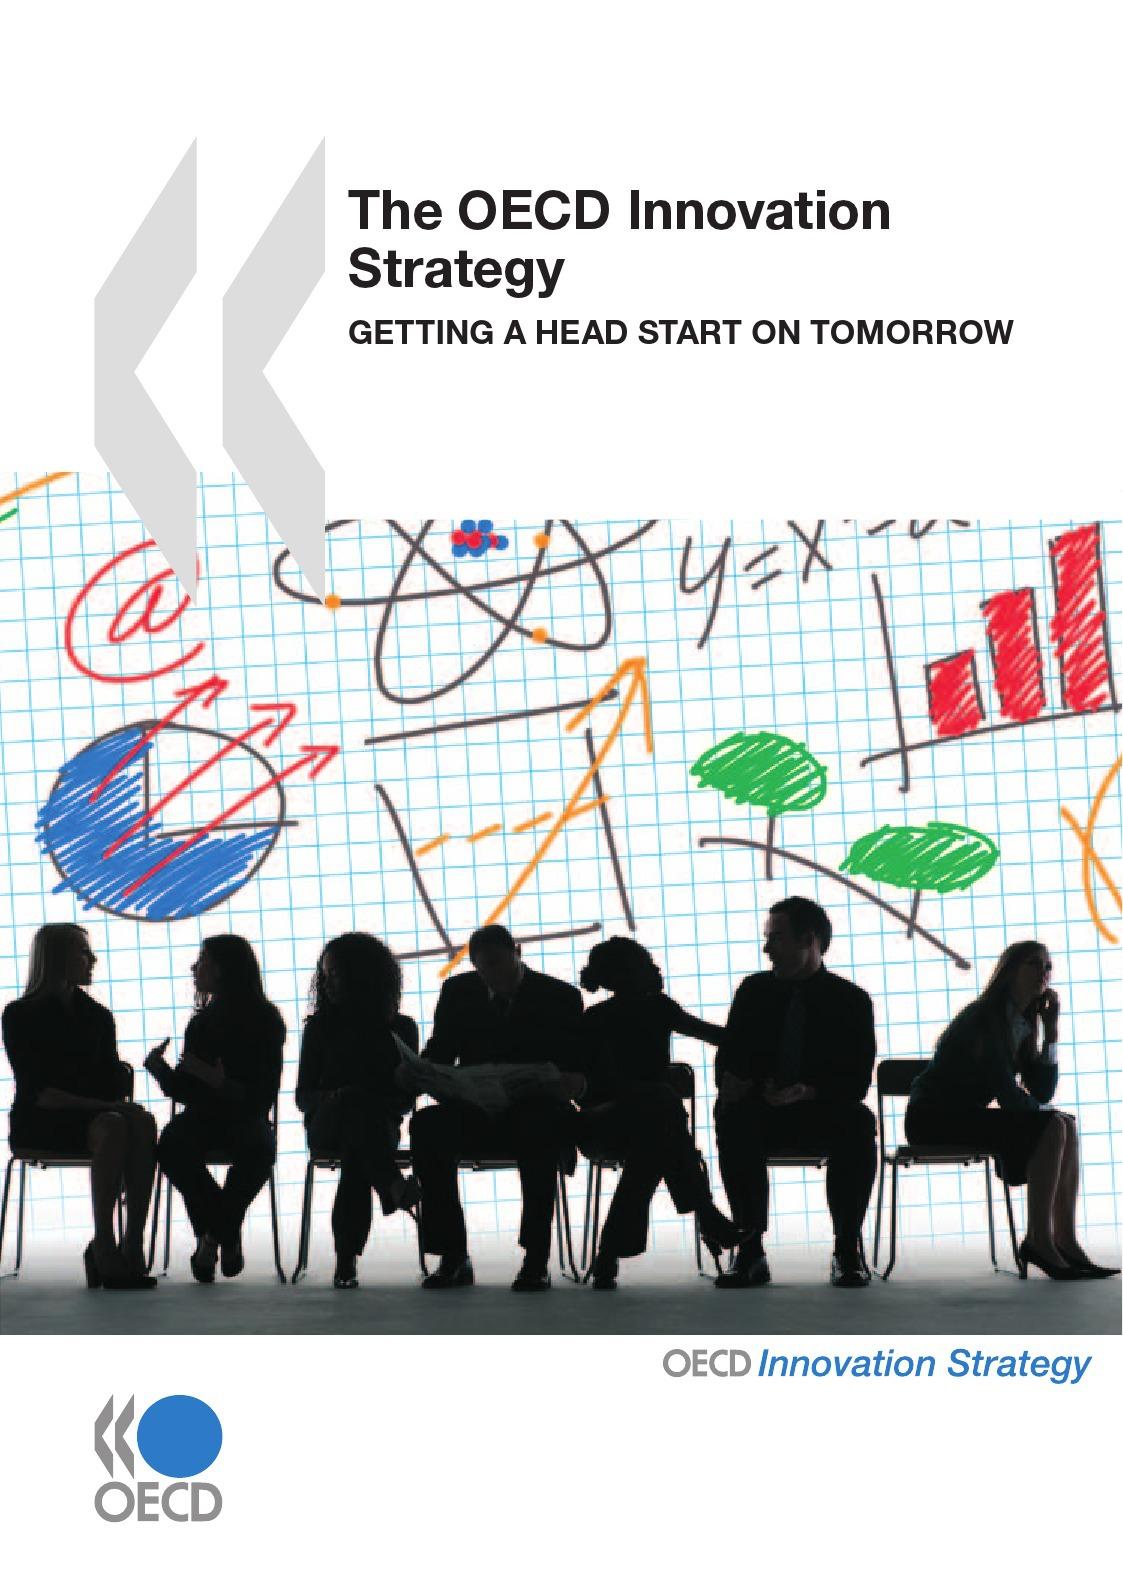 The OECD Innovation Strategy